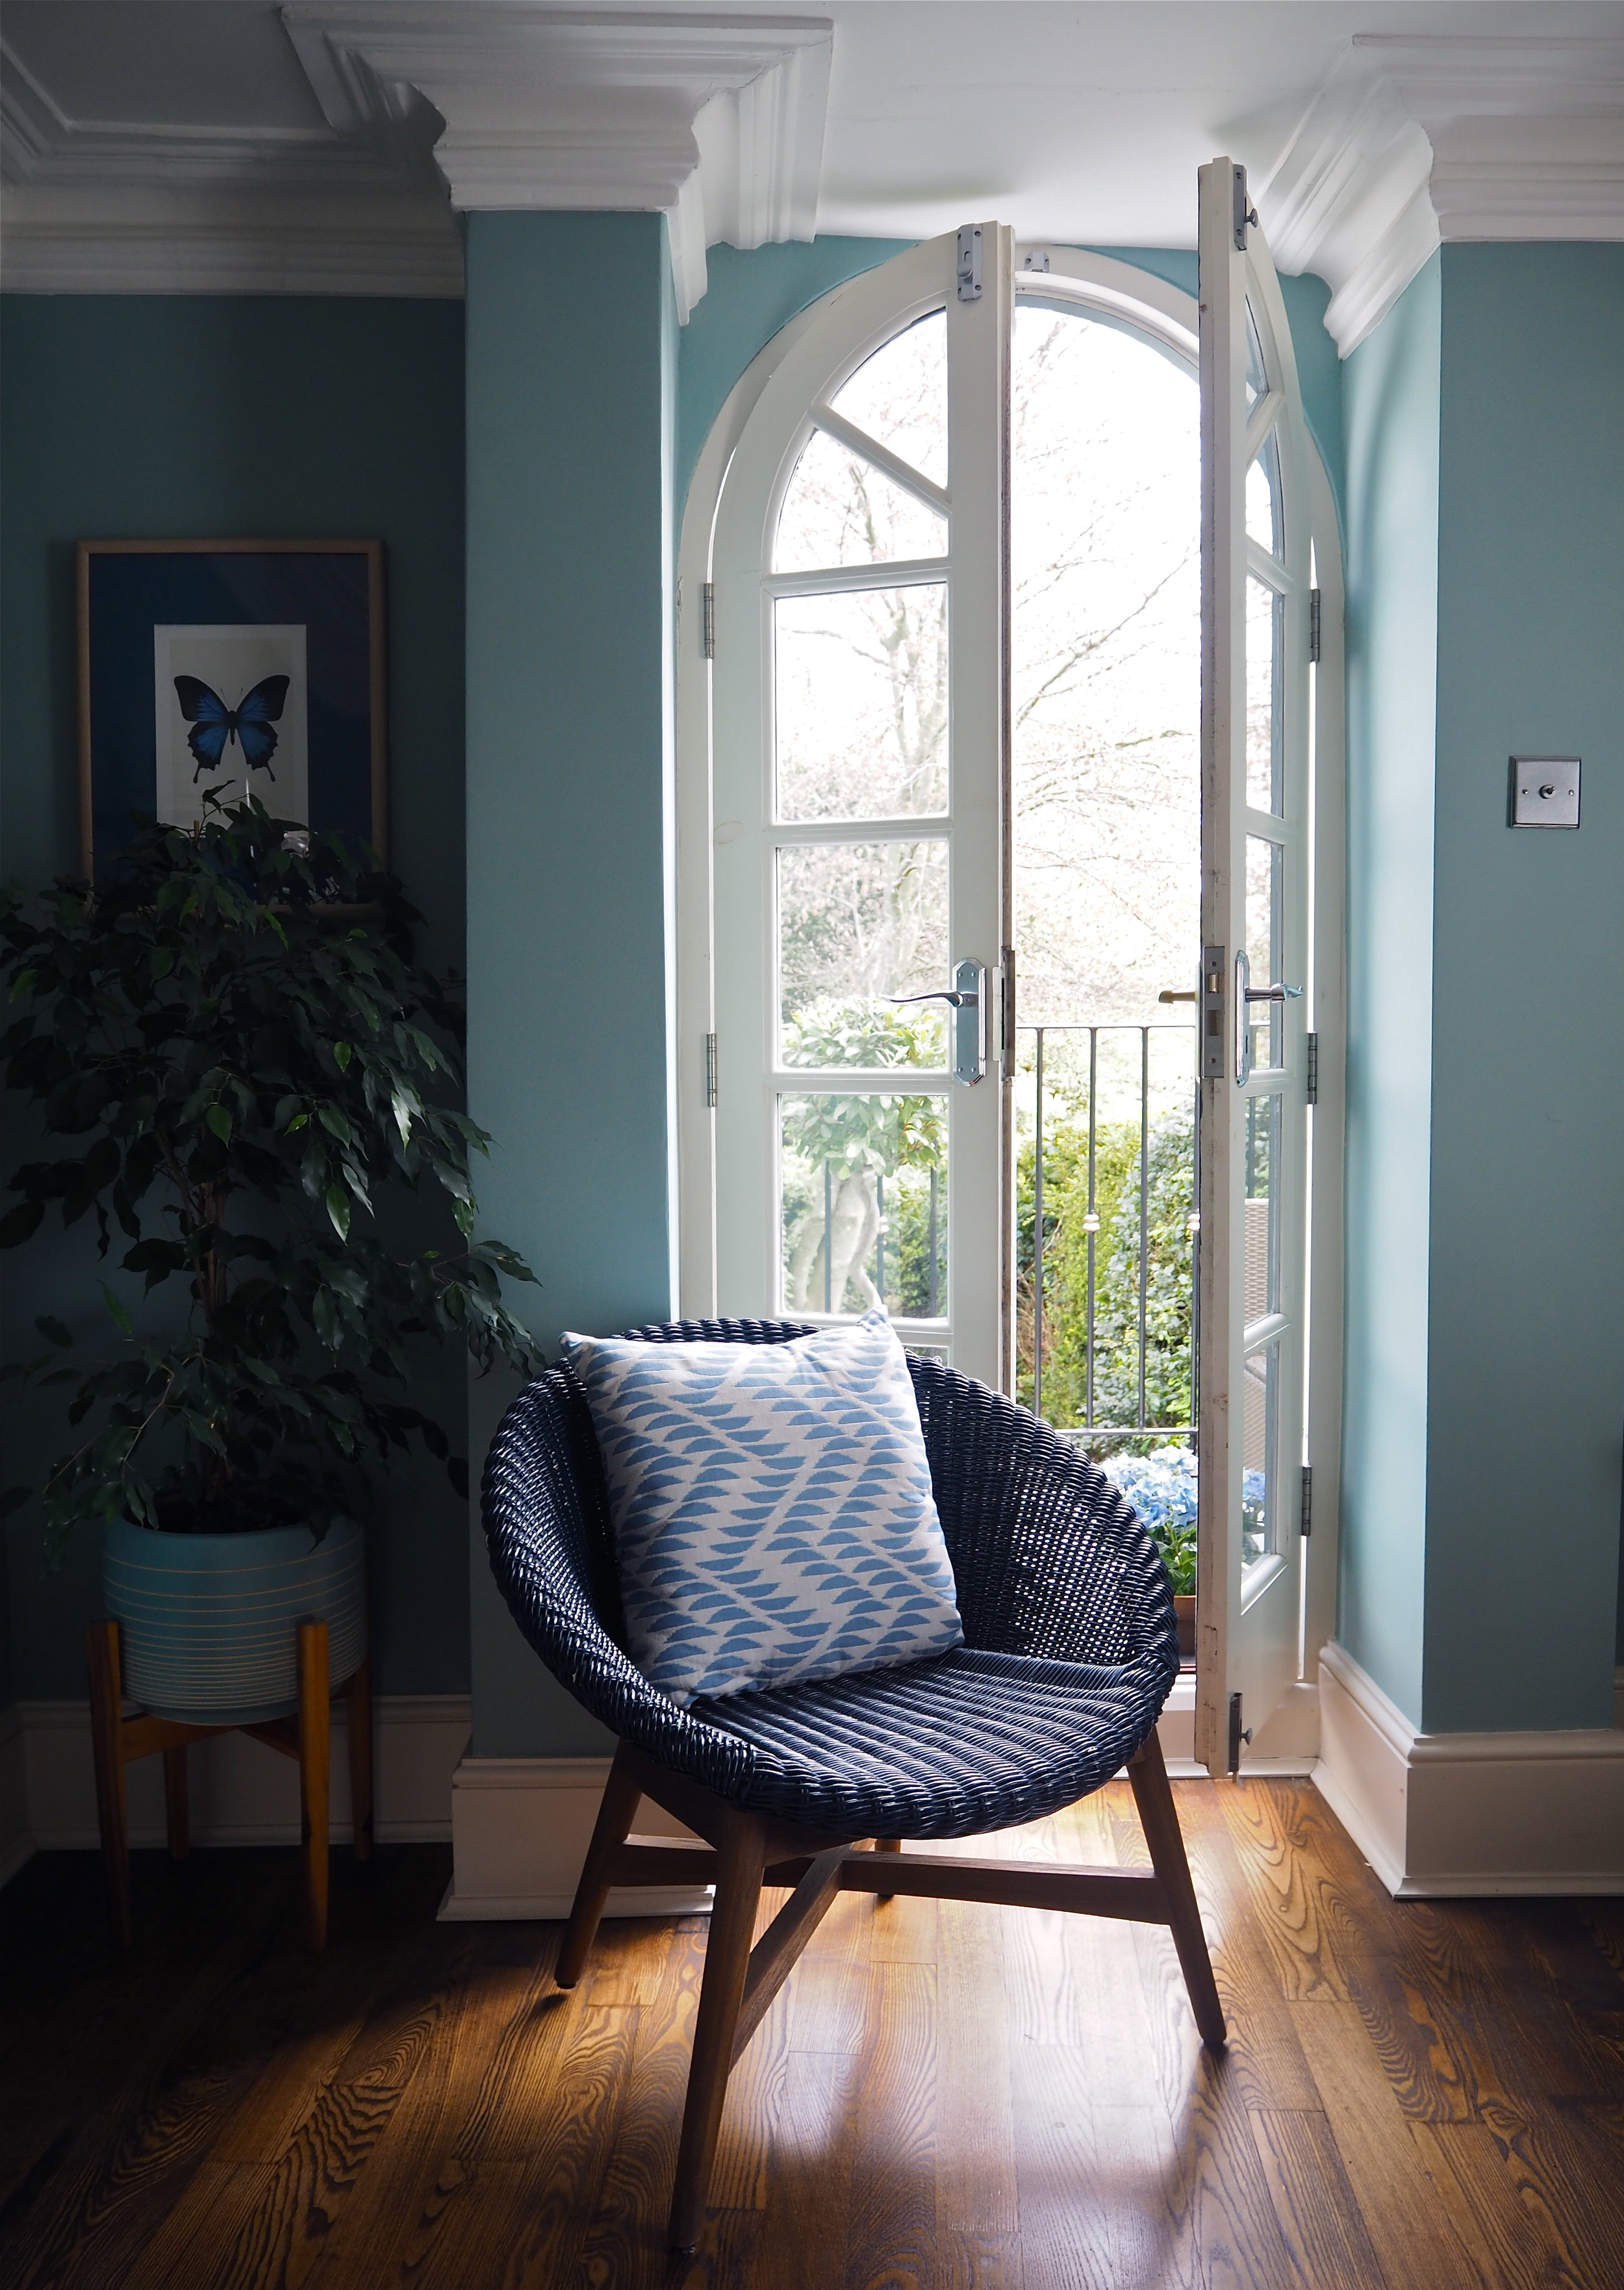 marks & spencer wicker garden chair